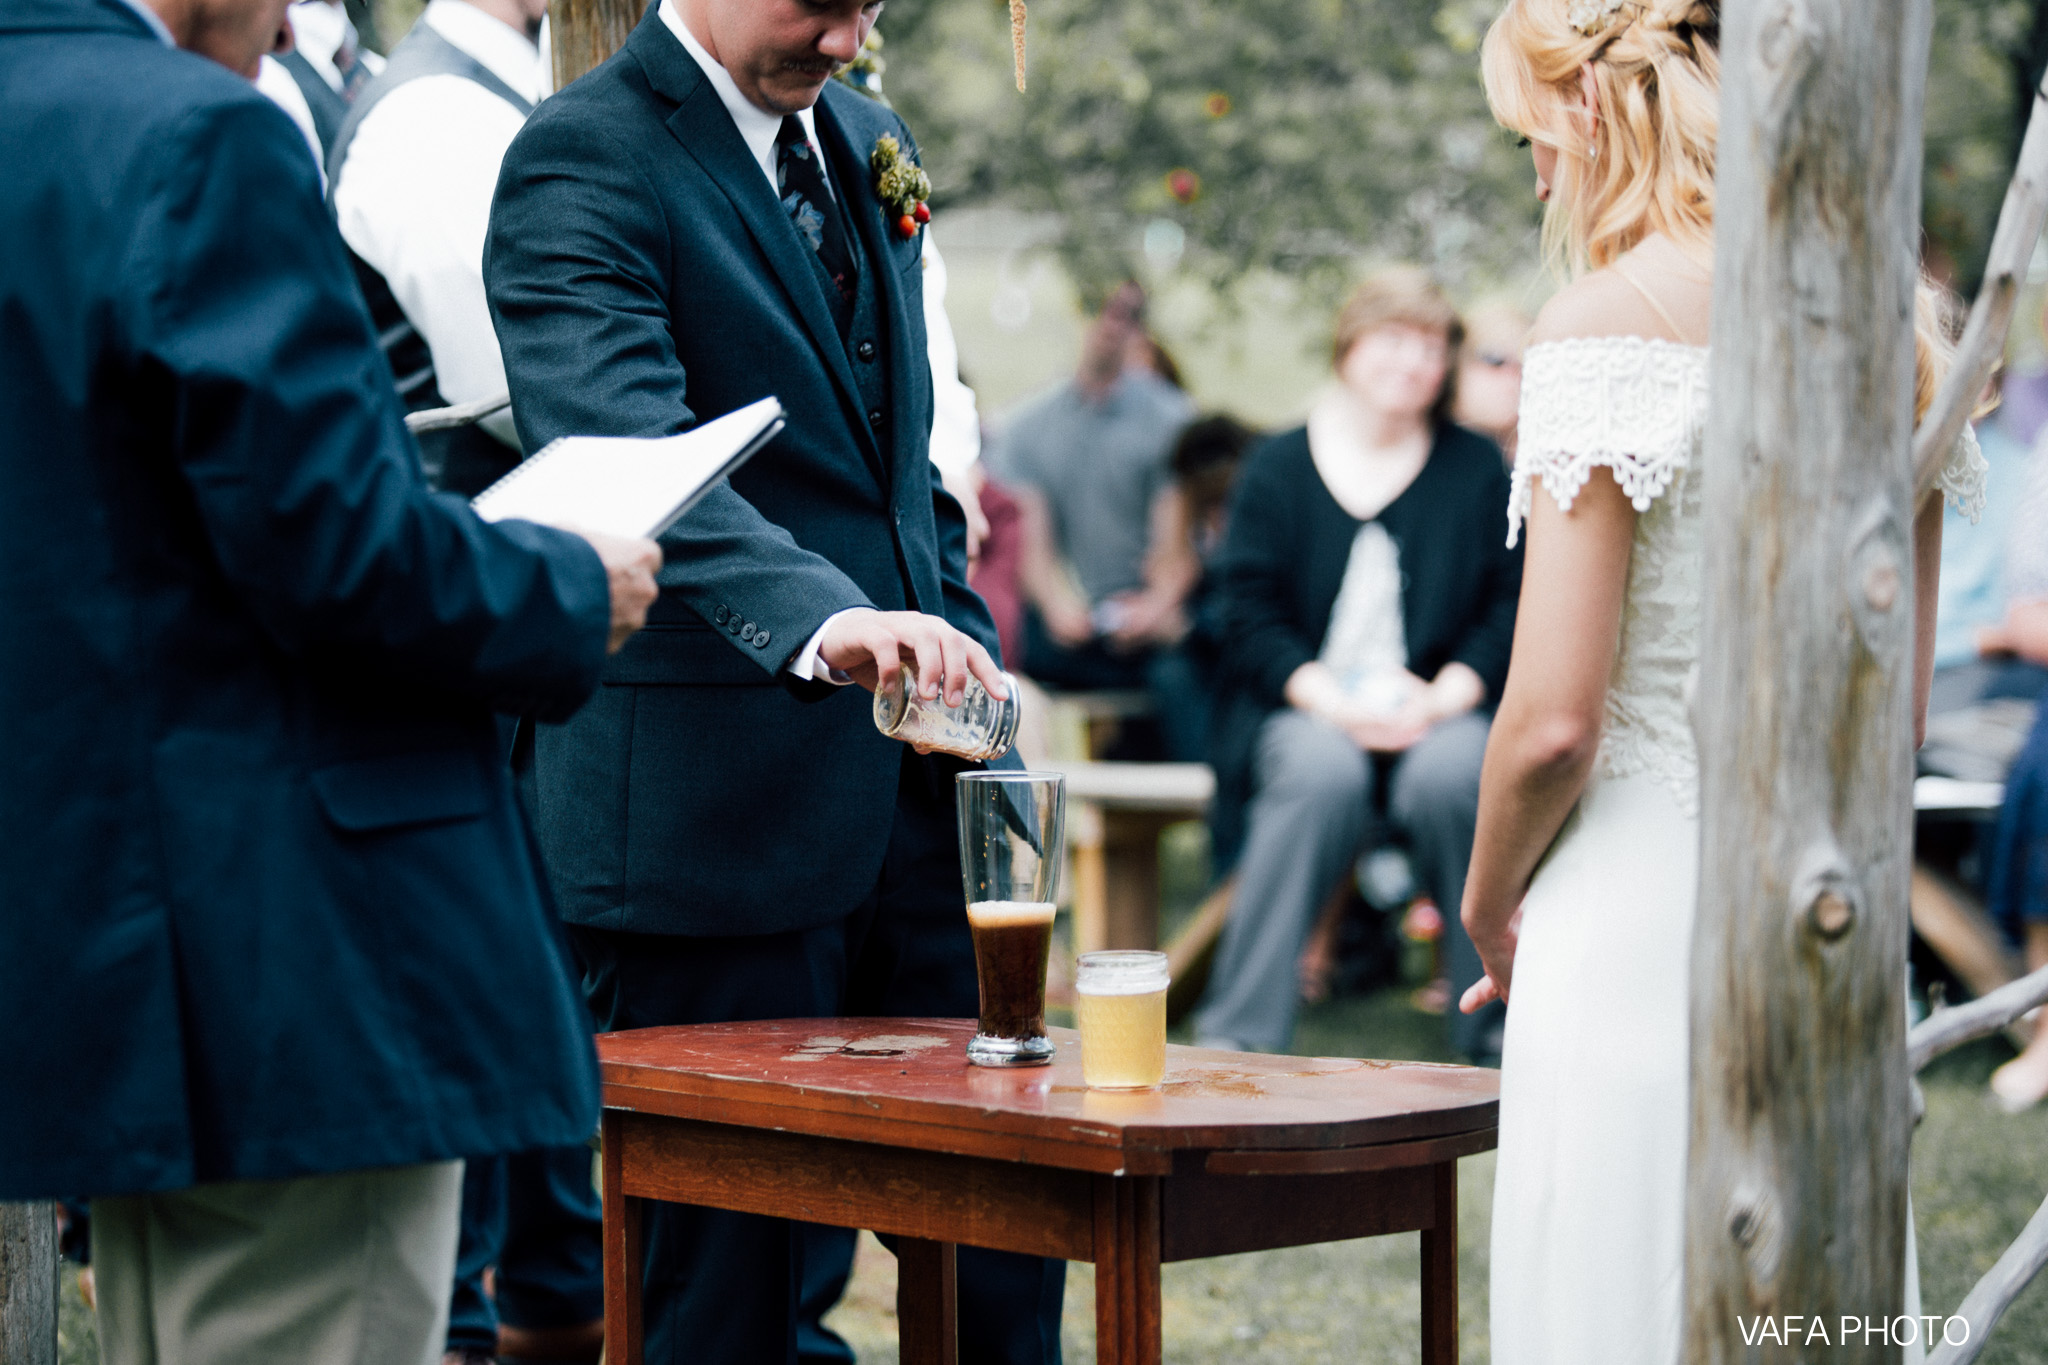 Belsolda-Farm-Wedding-Christy-Eric-Vafa-Photo-446.jpg